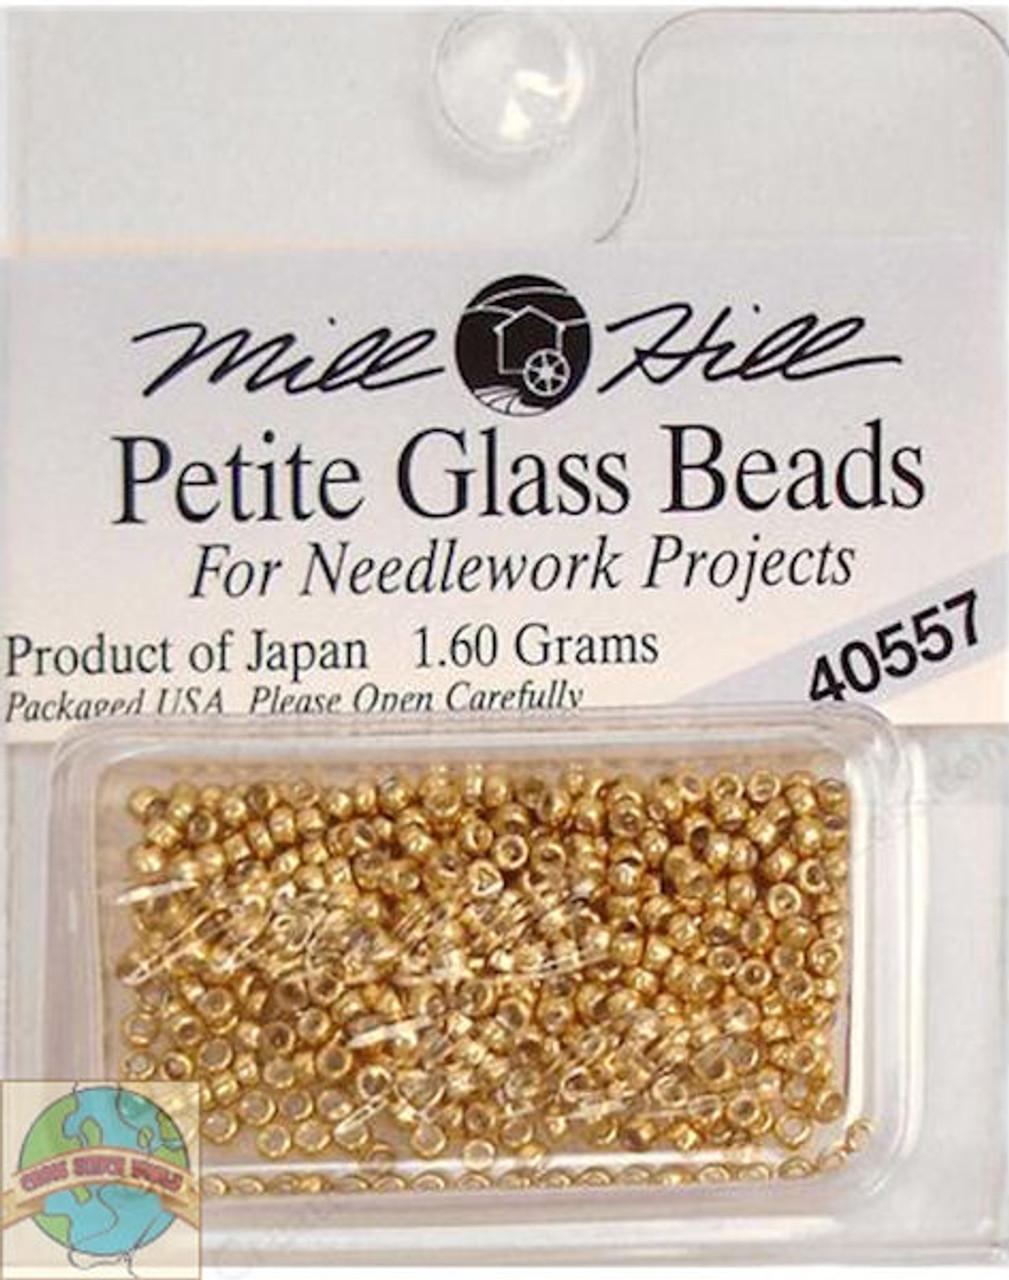 Mill Hill Petite Glass Beads 1.60g Gold #40557